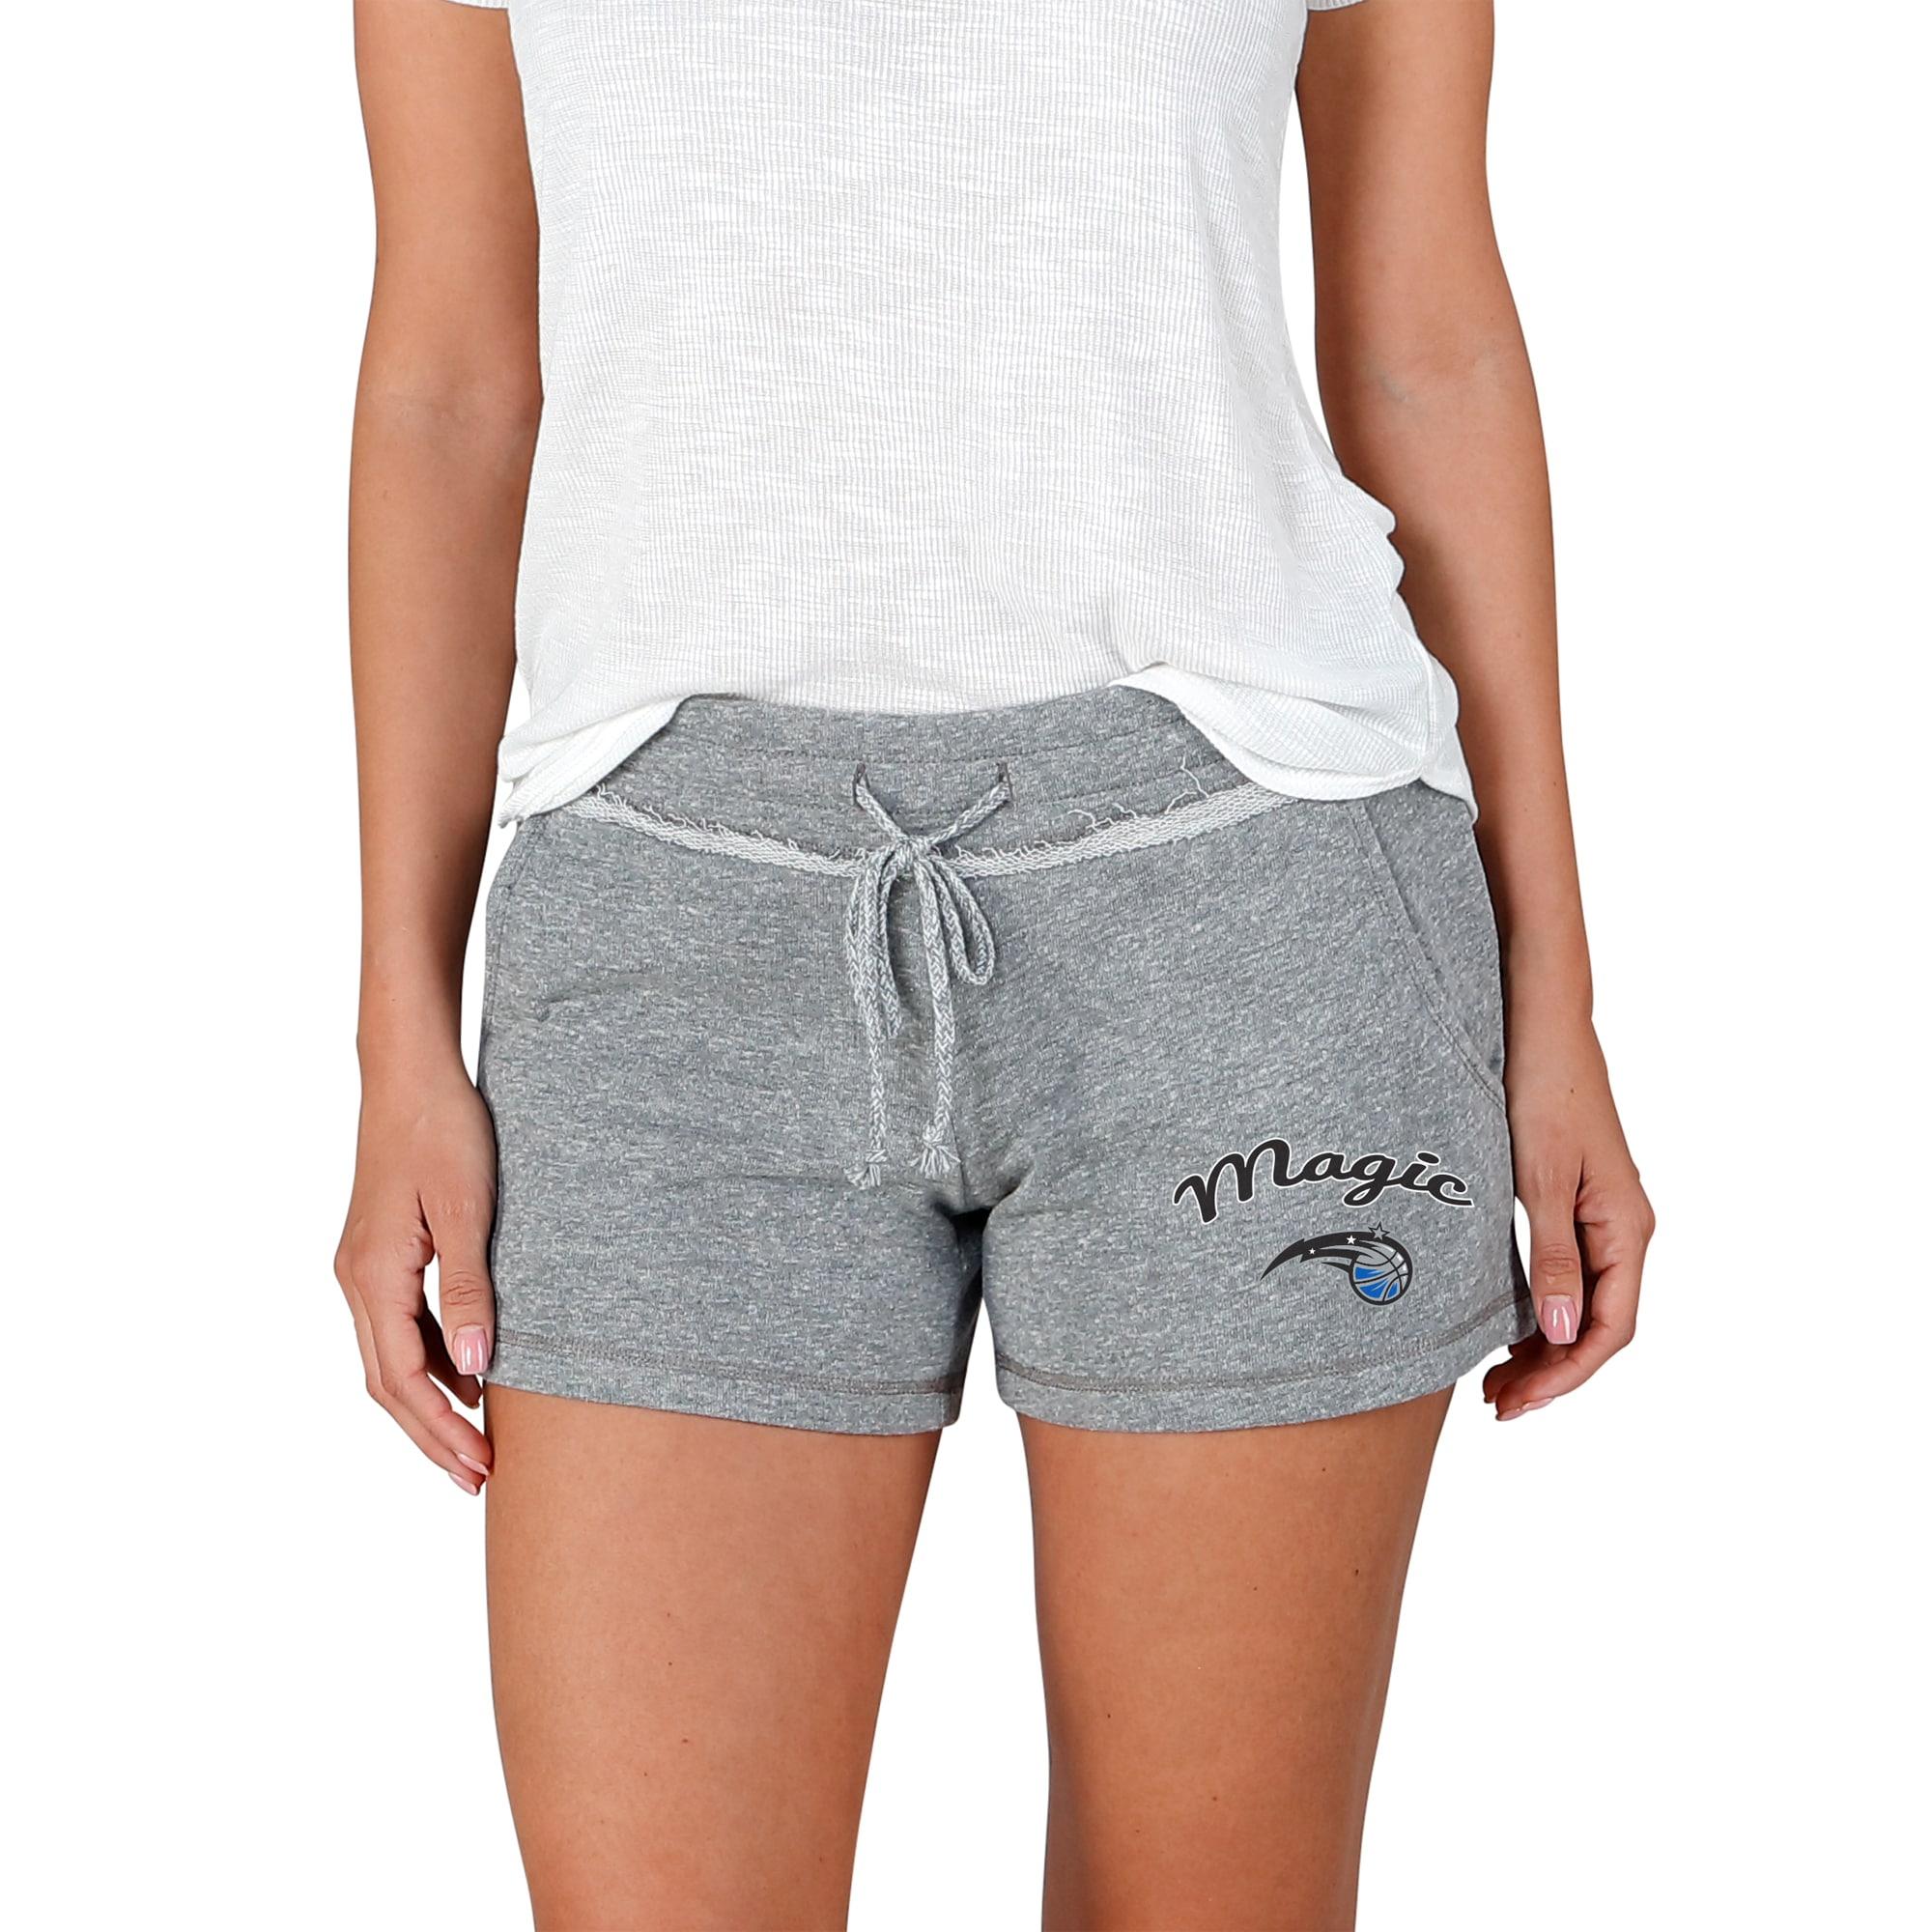 Orlando Magic Concepts Sport Women's Mainstream Terry Shorts - Gray